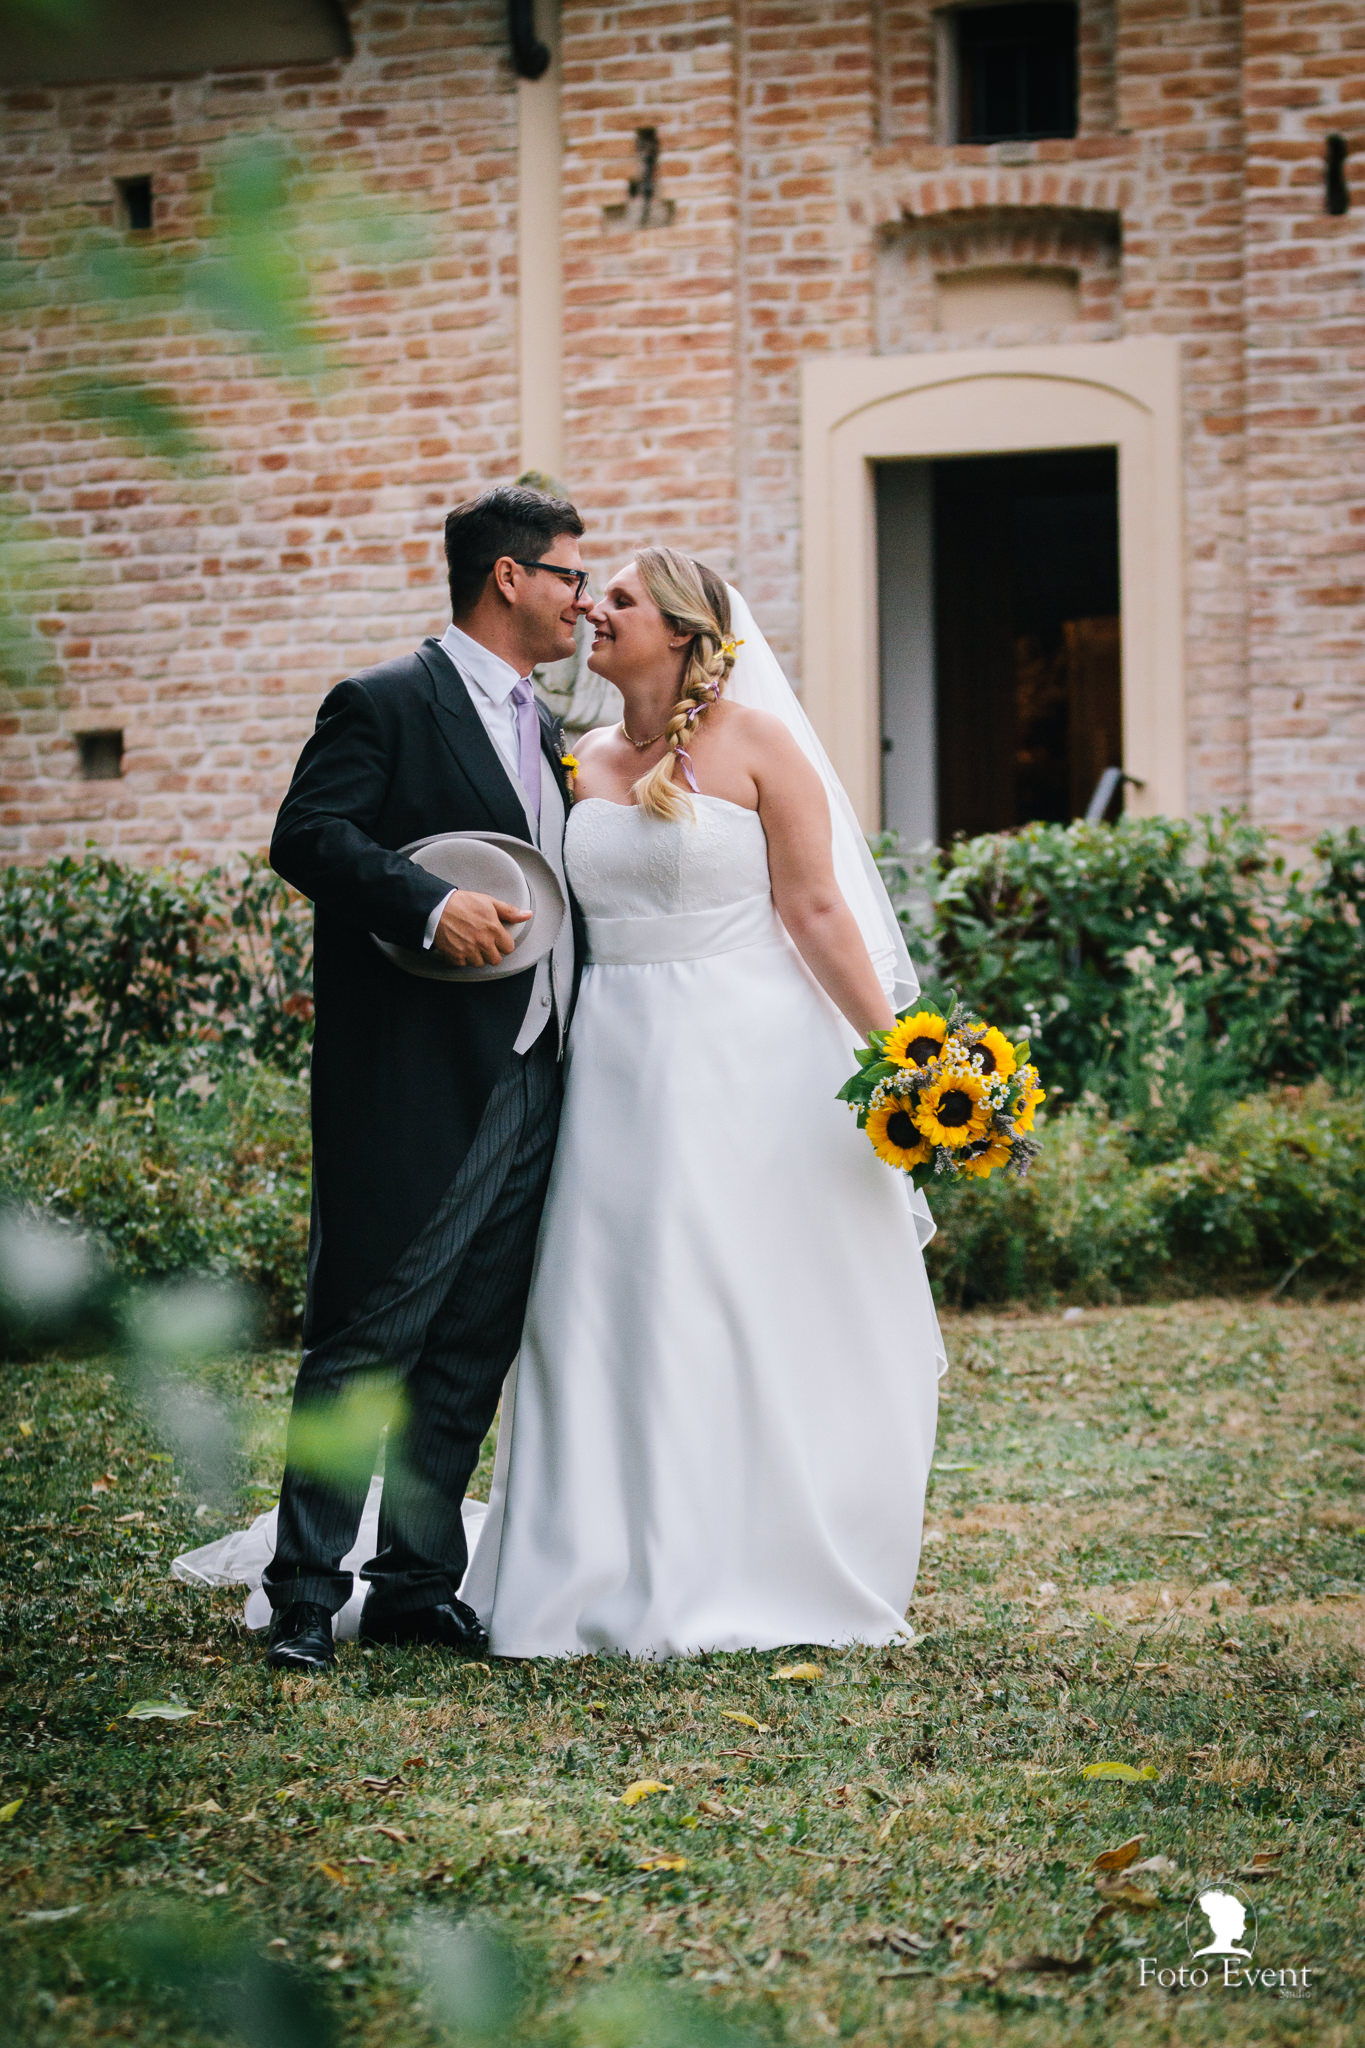 053-2019-07-27-Matrimonio-Valentina-e-Alessandro-Pettinari-zoom-510